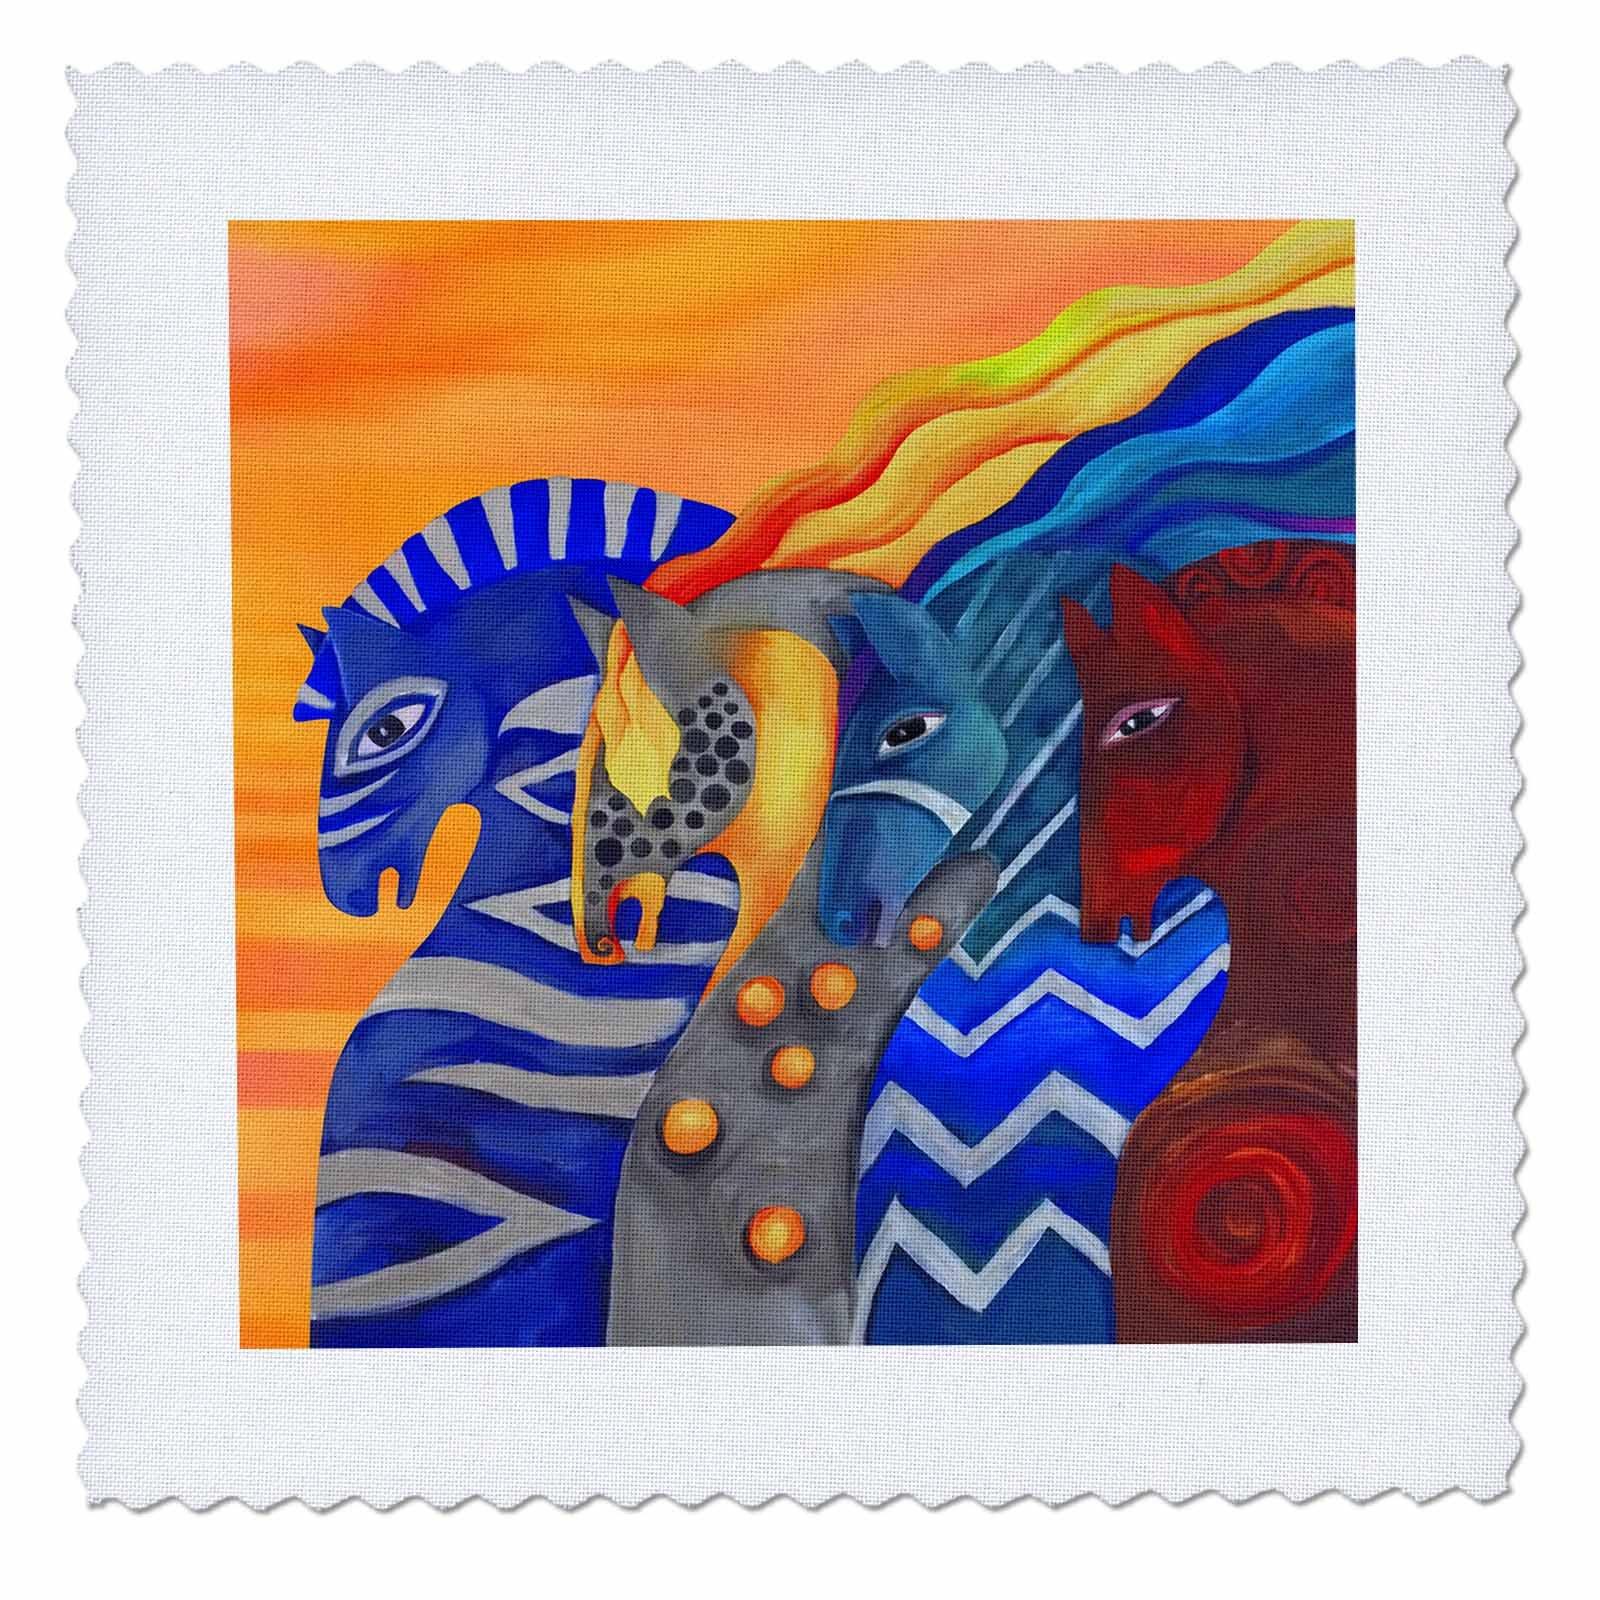 3dRose Dasistleyli - Animals - Impressionistic drawing of four horses denoting four elements - 22x22 inch quilt square (qs_280175_9)